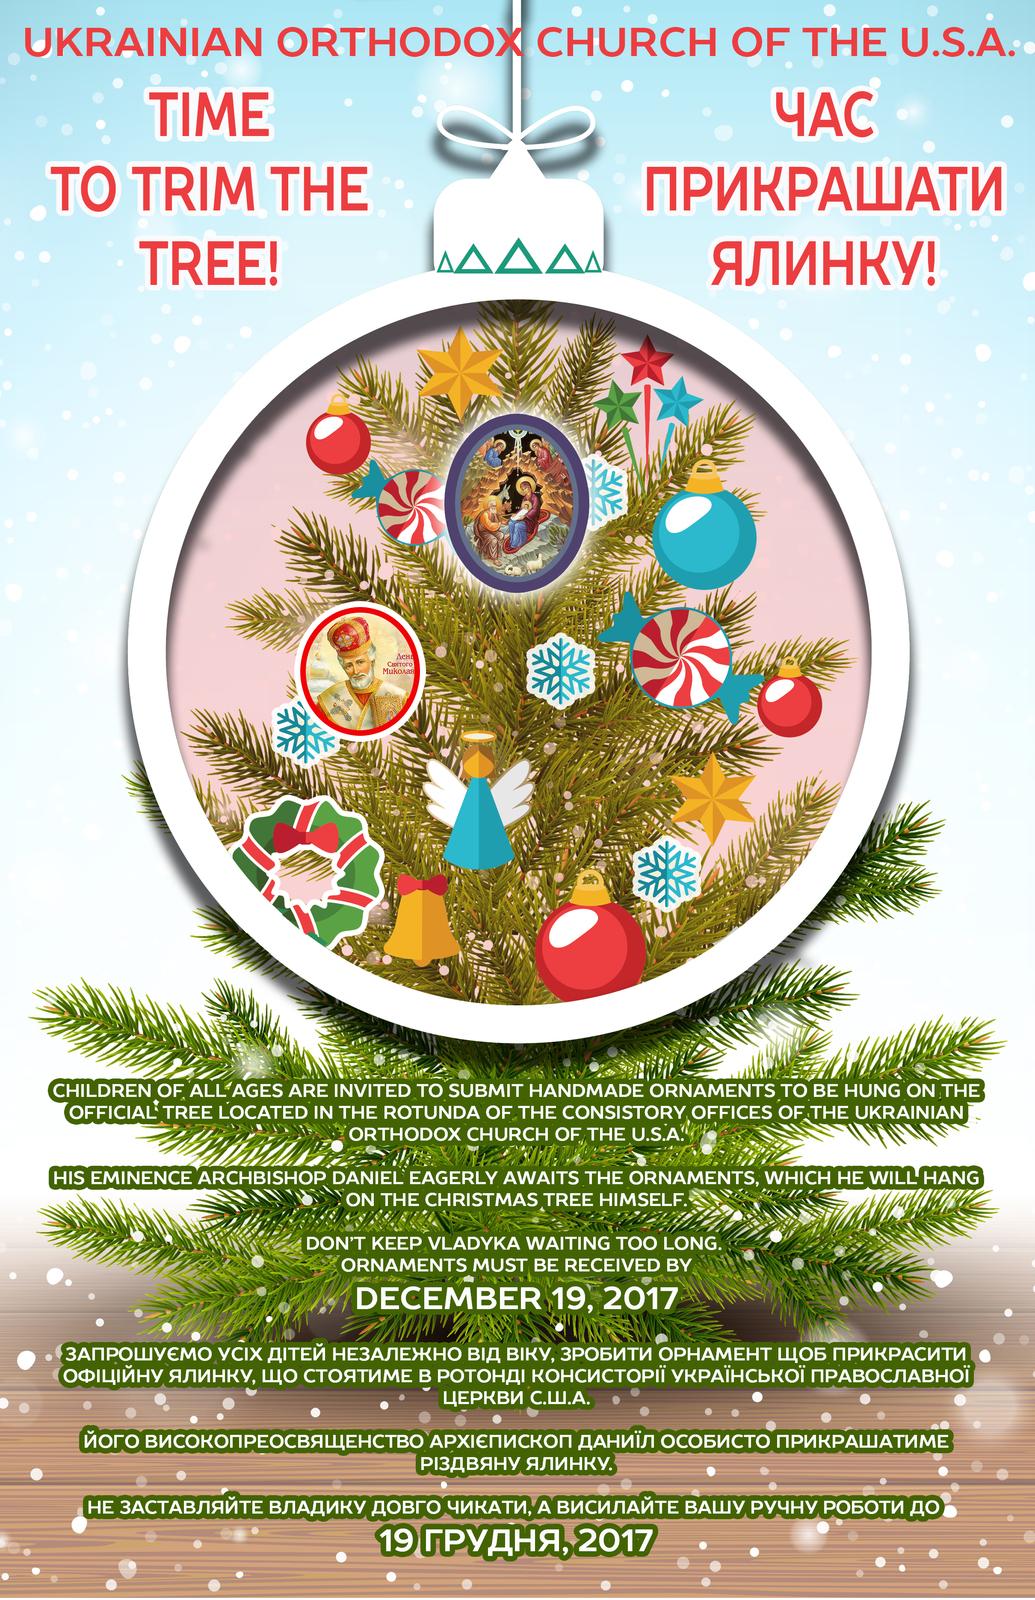 Ukrainian Orthodox Church Of The Usa Christmas Ornaments For The